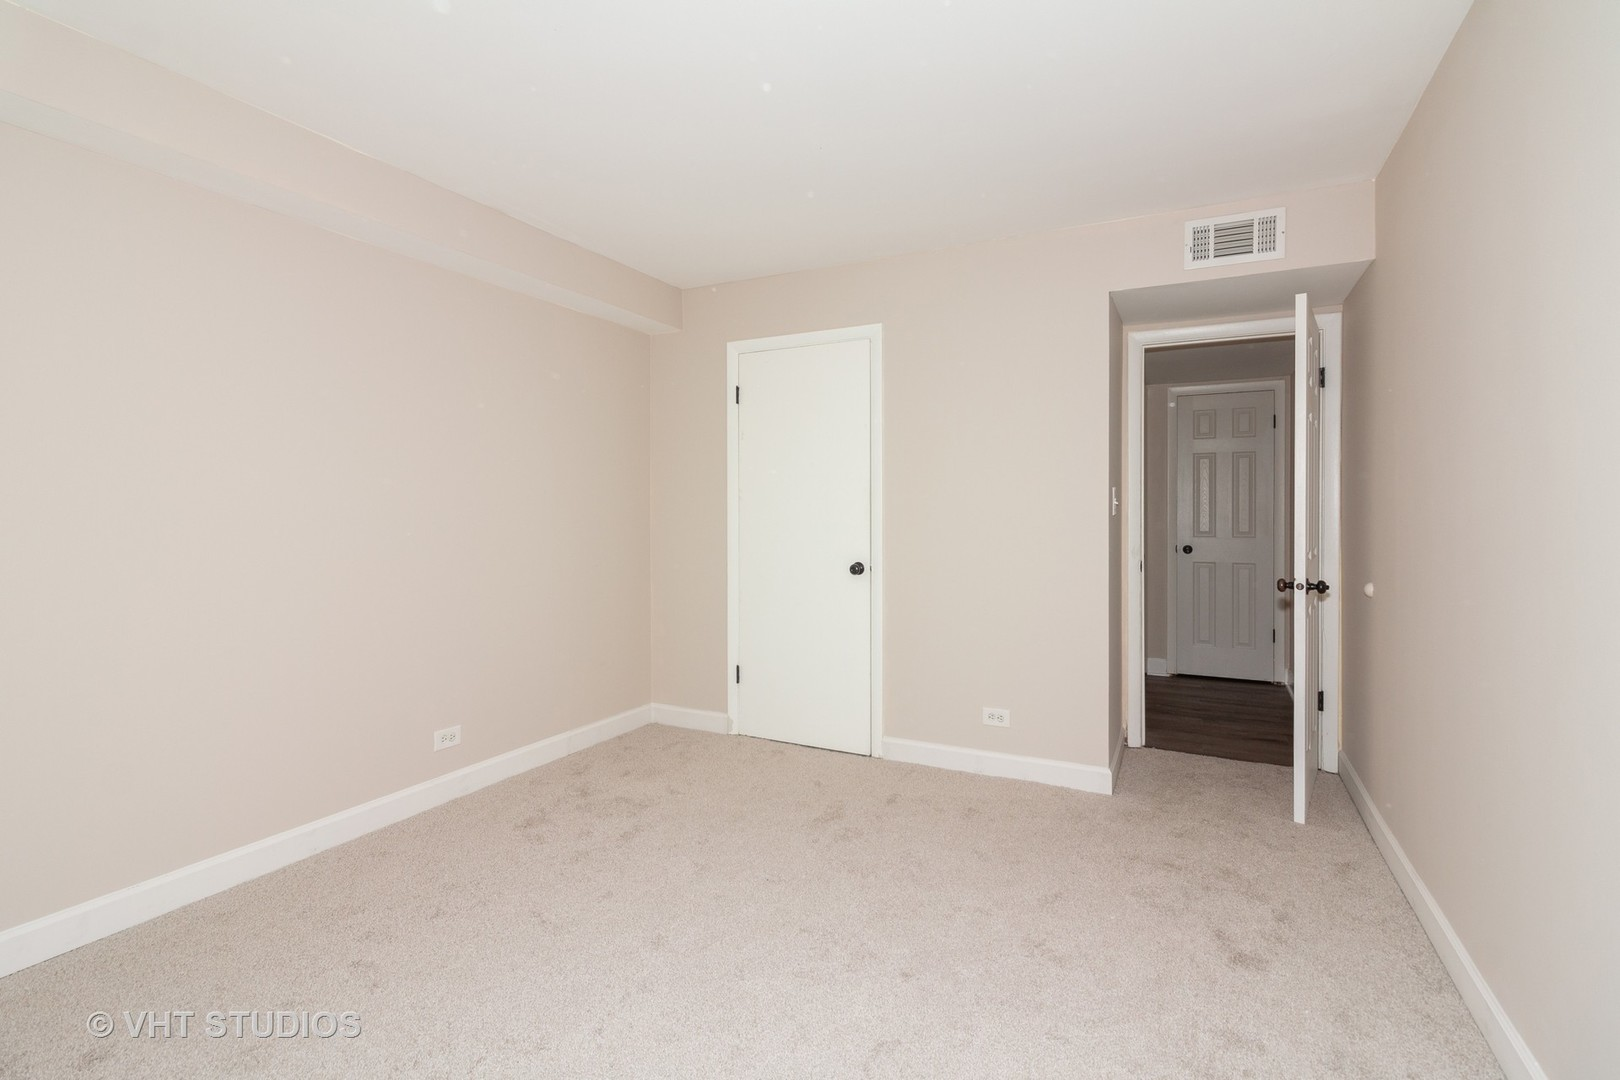 3B Kingery Quarter 105, WILLOWBROOK, Illinois, 60527